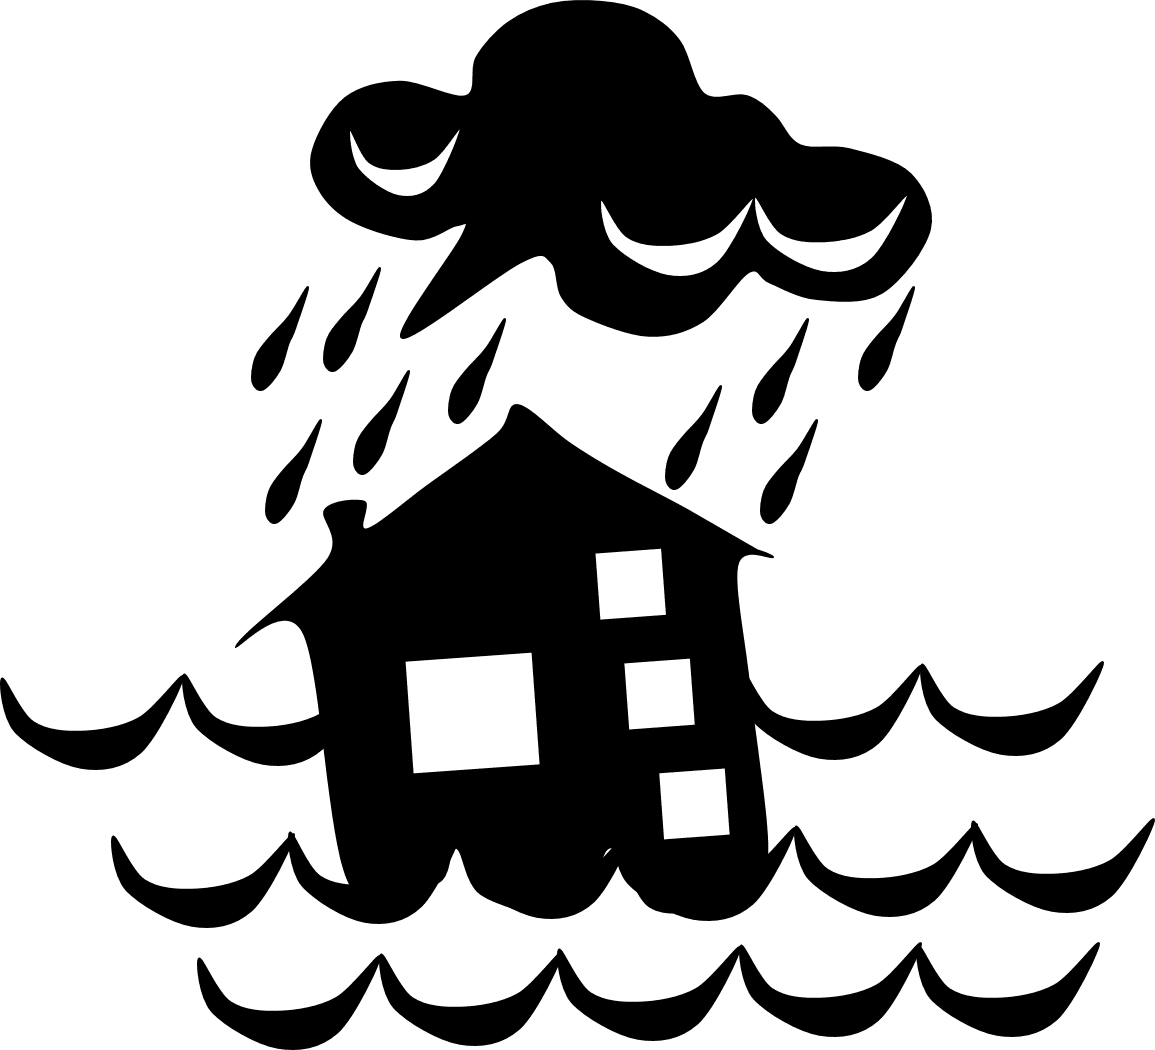 Natural Disasters Cliparts